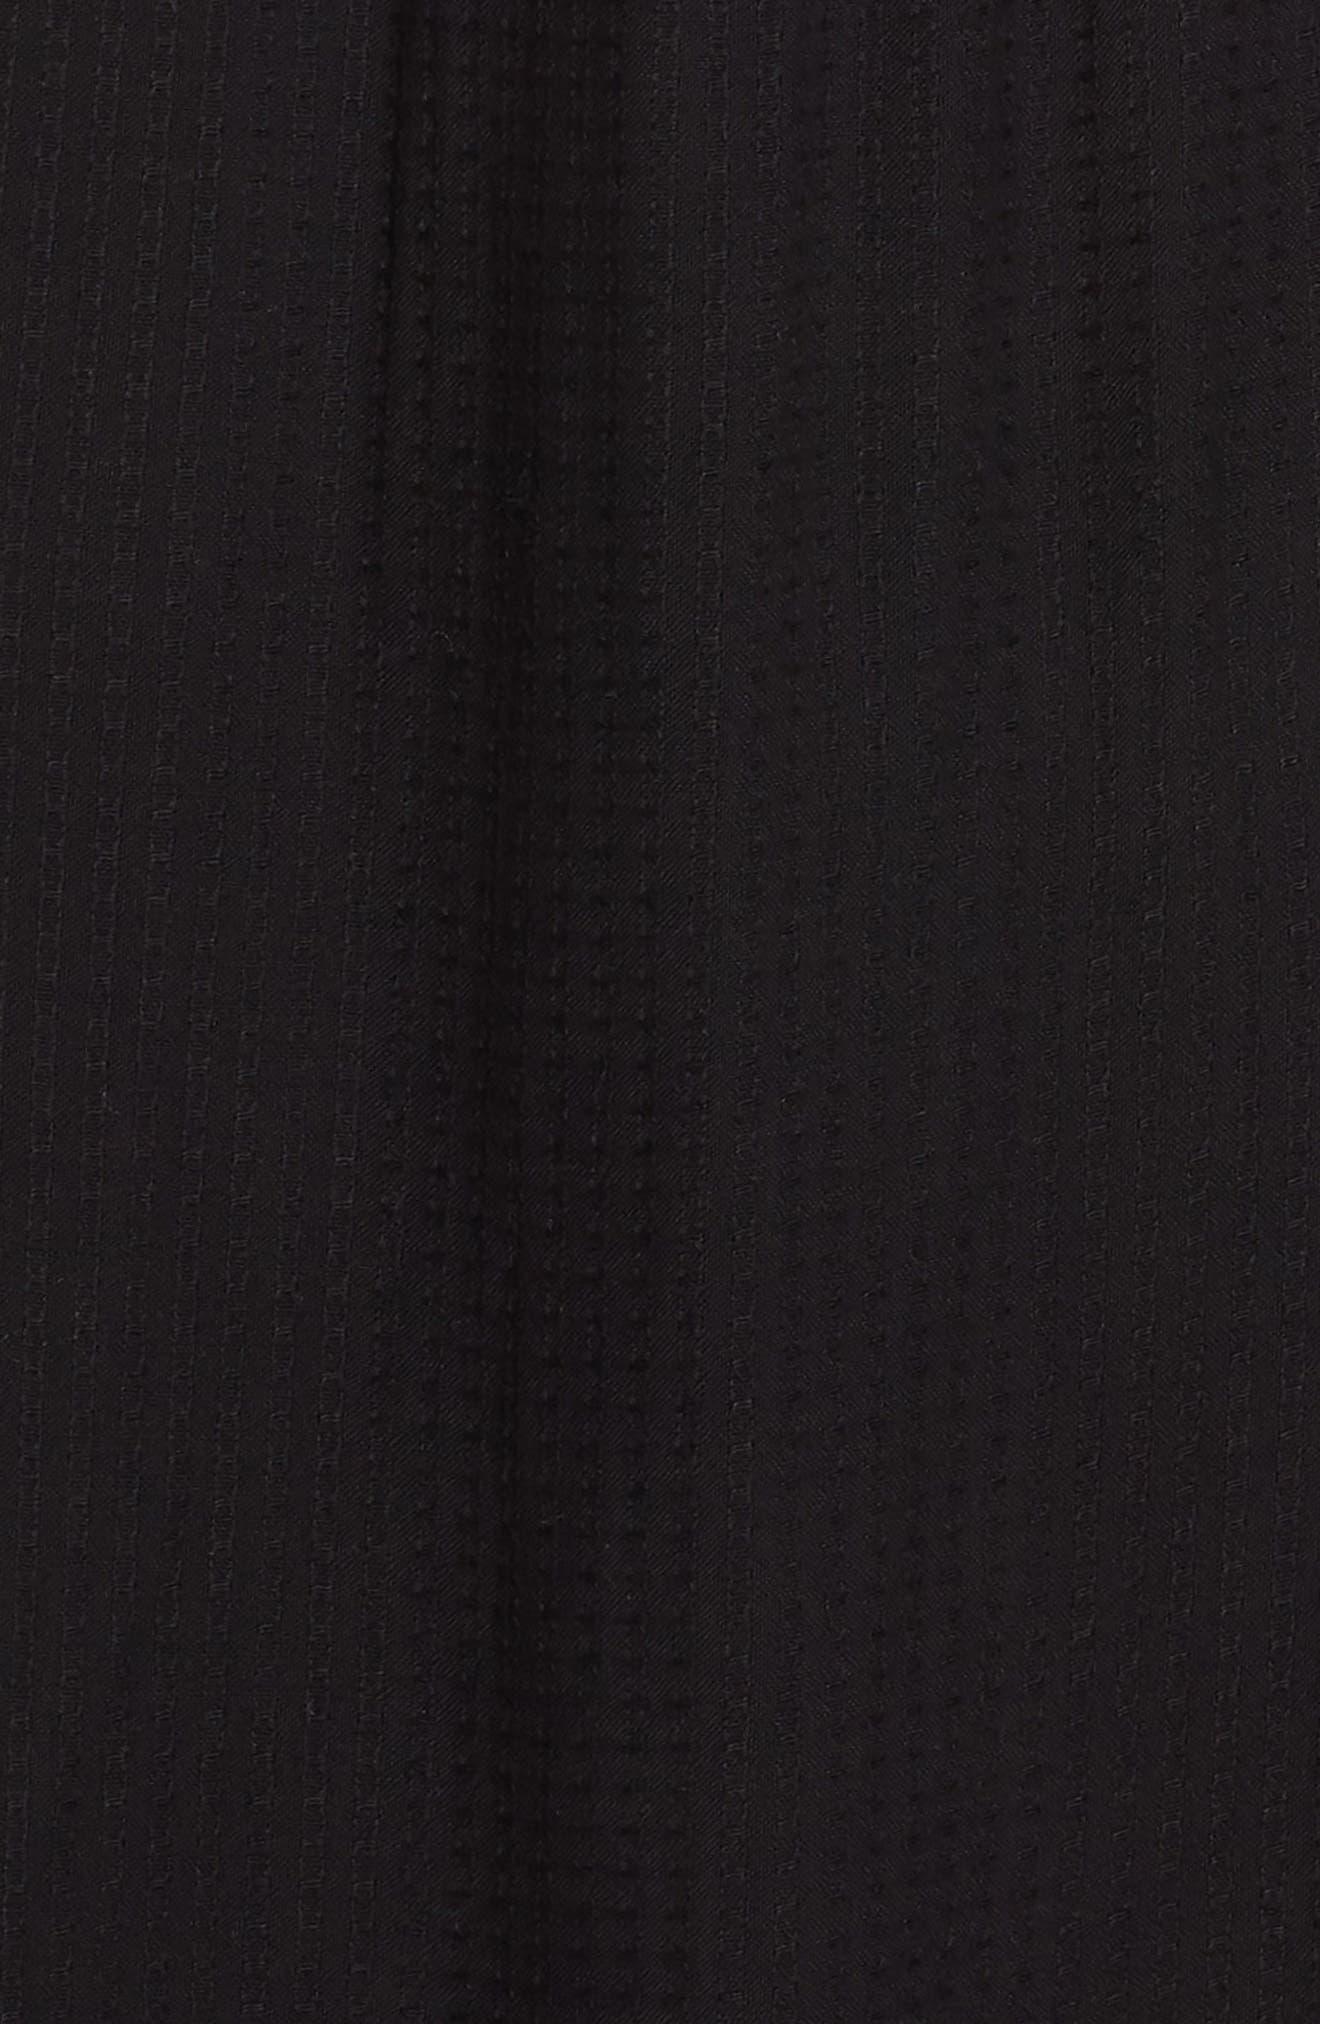 Cory Open Back Cover-Up Midi Dress,                             Alternate thumbnail 5, color,                             BLACK